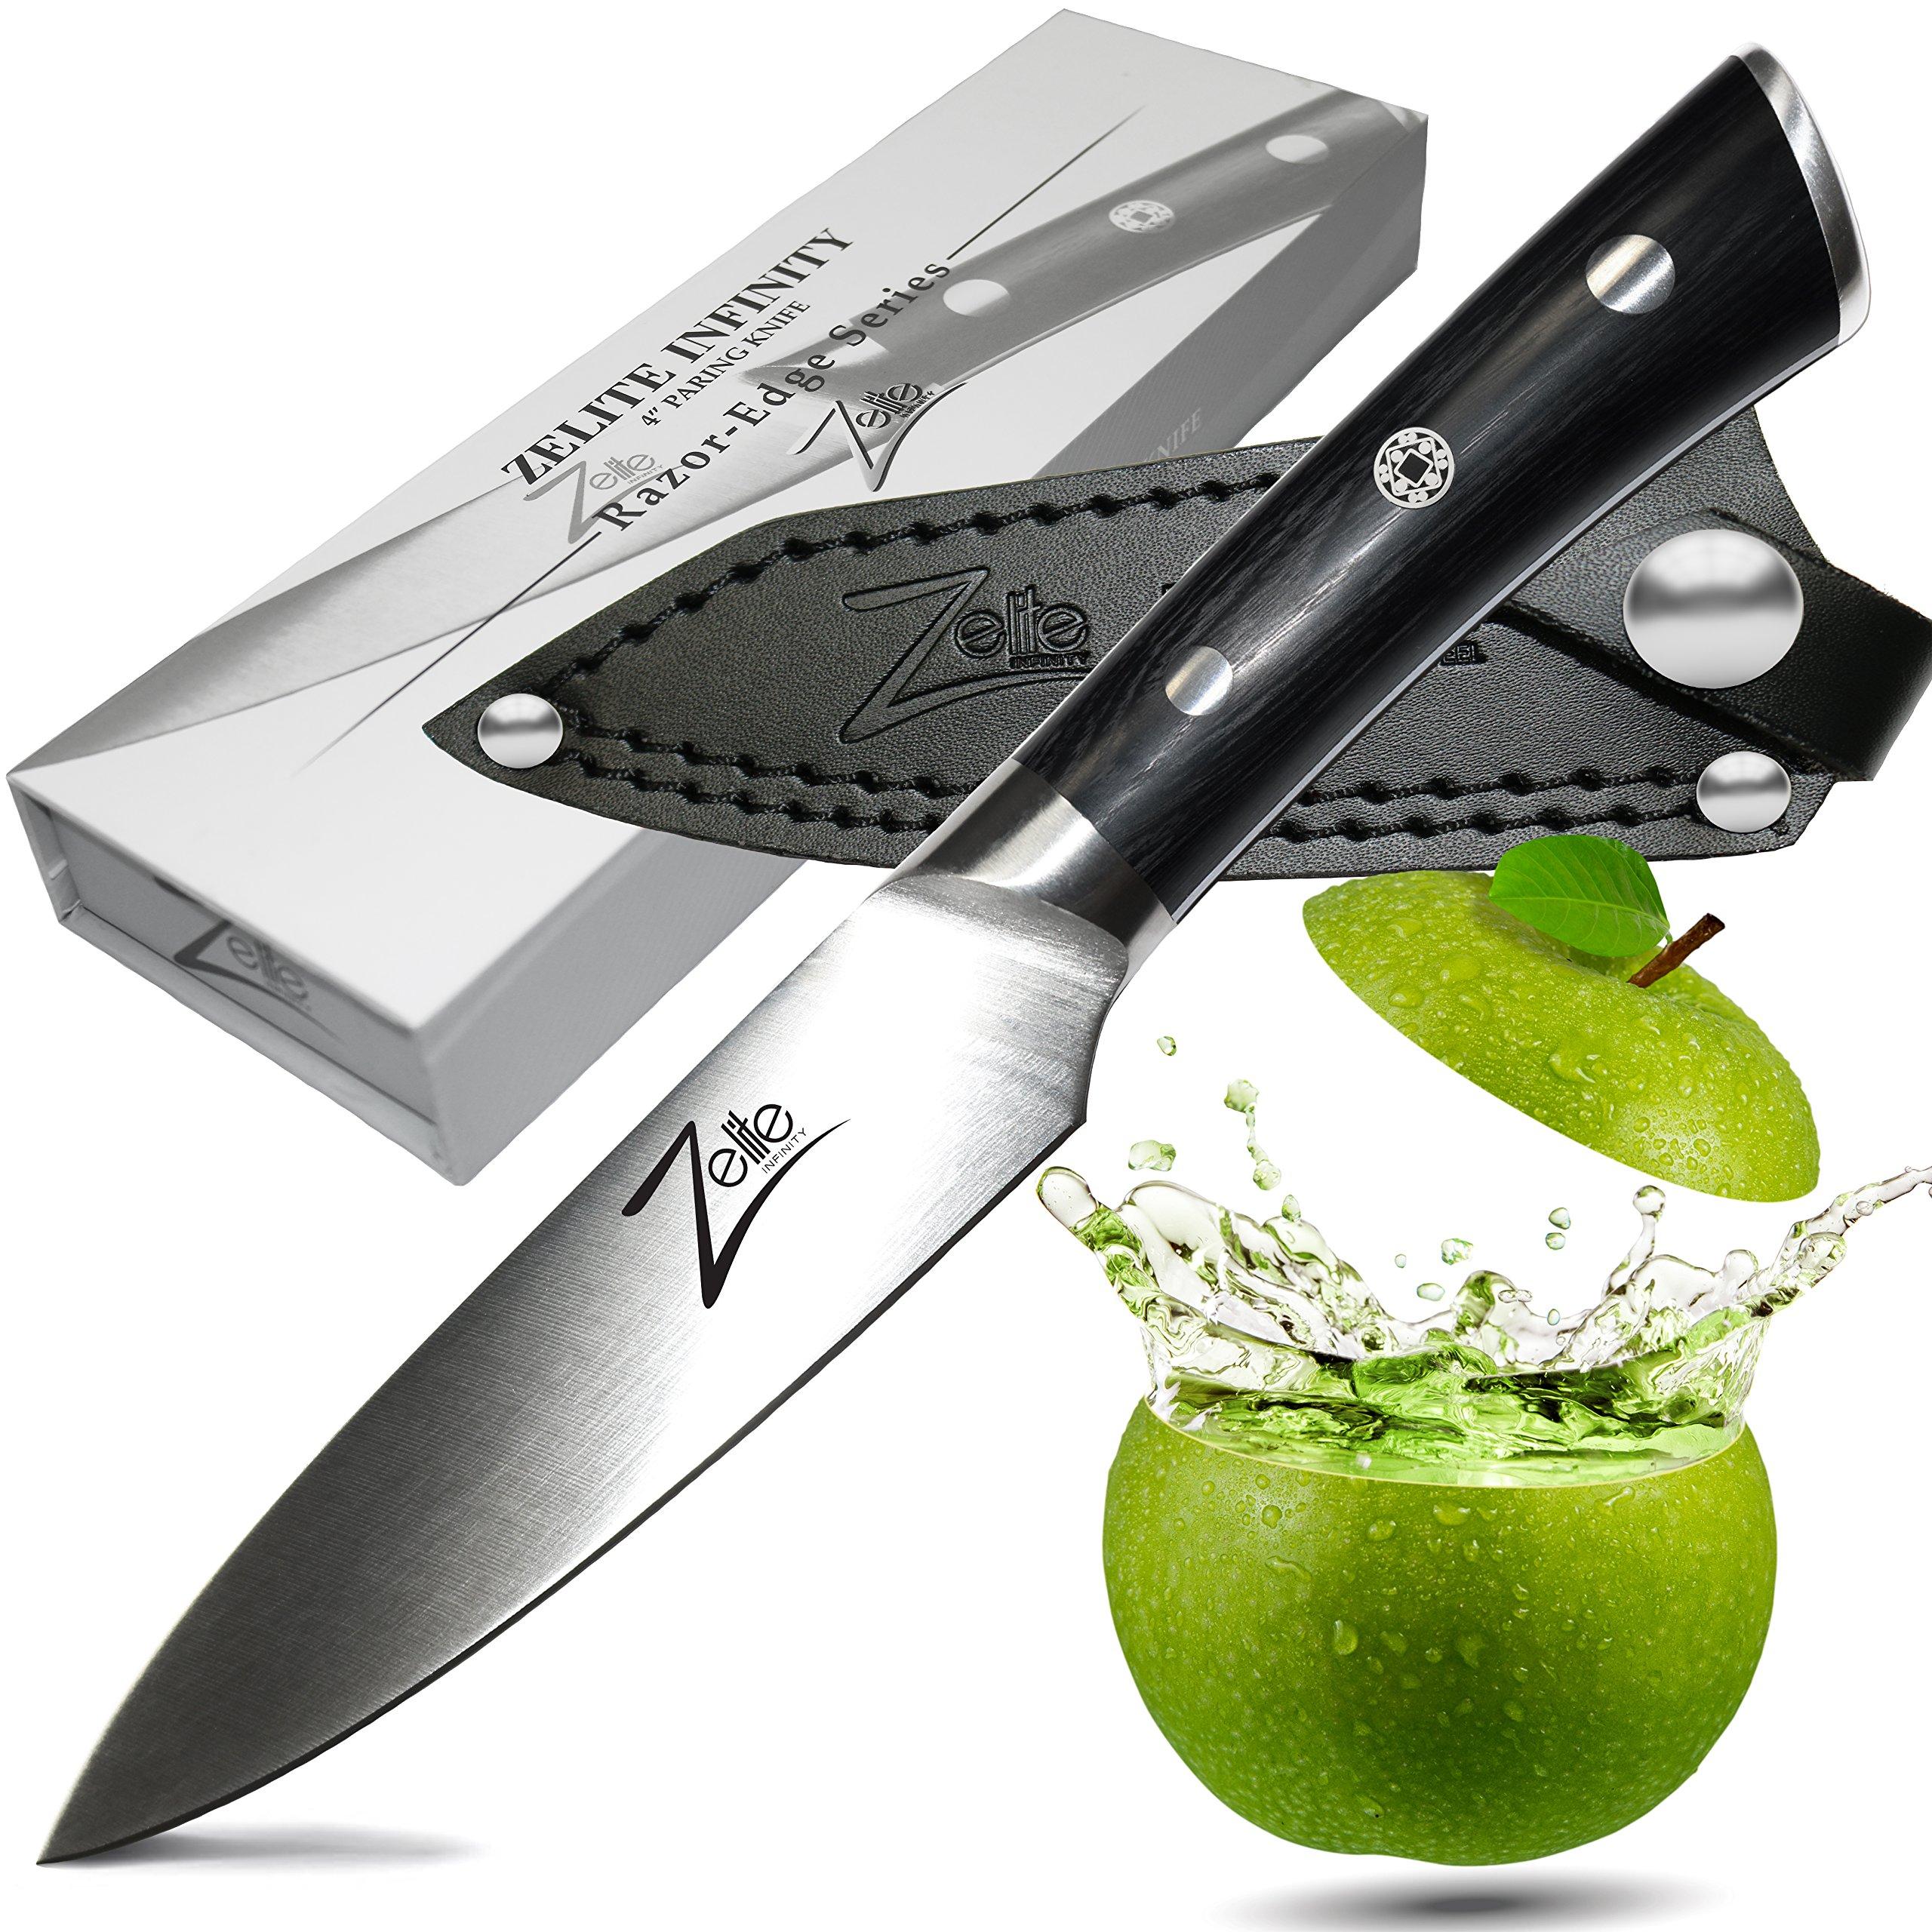 ZELITE INFINITY Paring Knife 4 Inch >> Razor-Edge Series > Best Quality Japanese AUS8 High Carbon Stainless Steel, Black Pakkawood Handle, Full-tang, Sleek Chef Design, Ultra-Premium Leather Sheath by Zelite Infinity